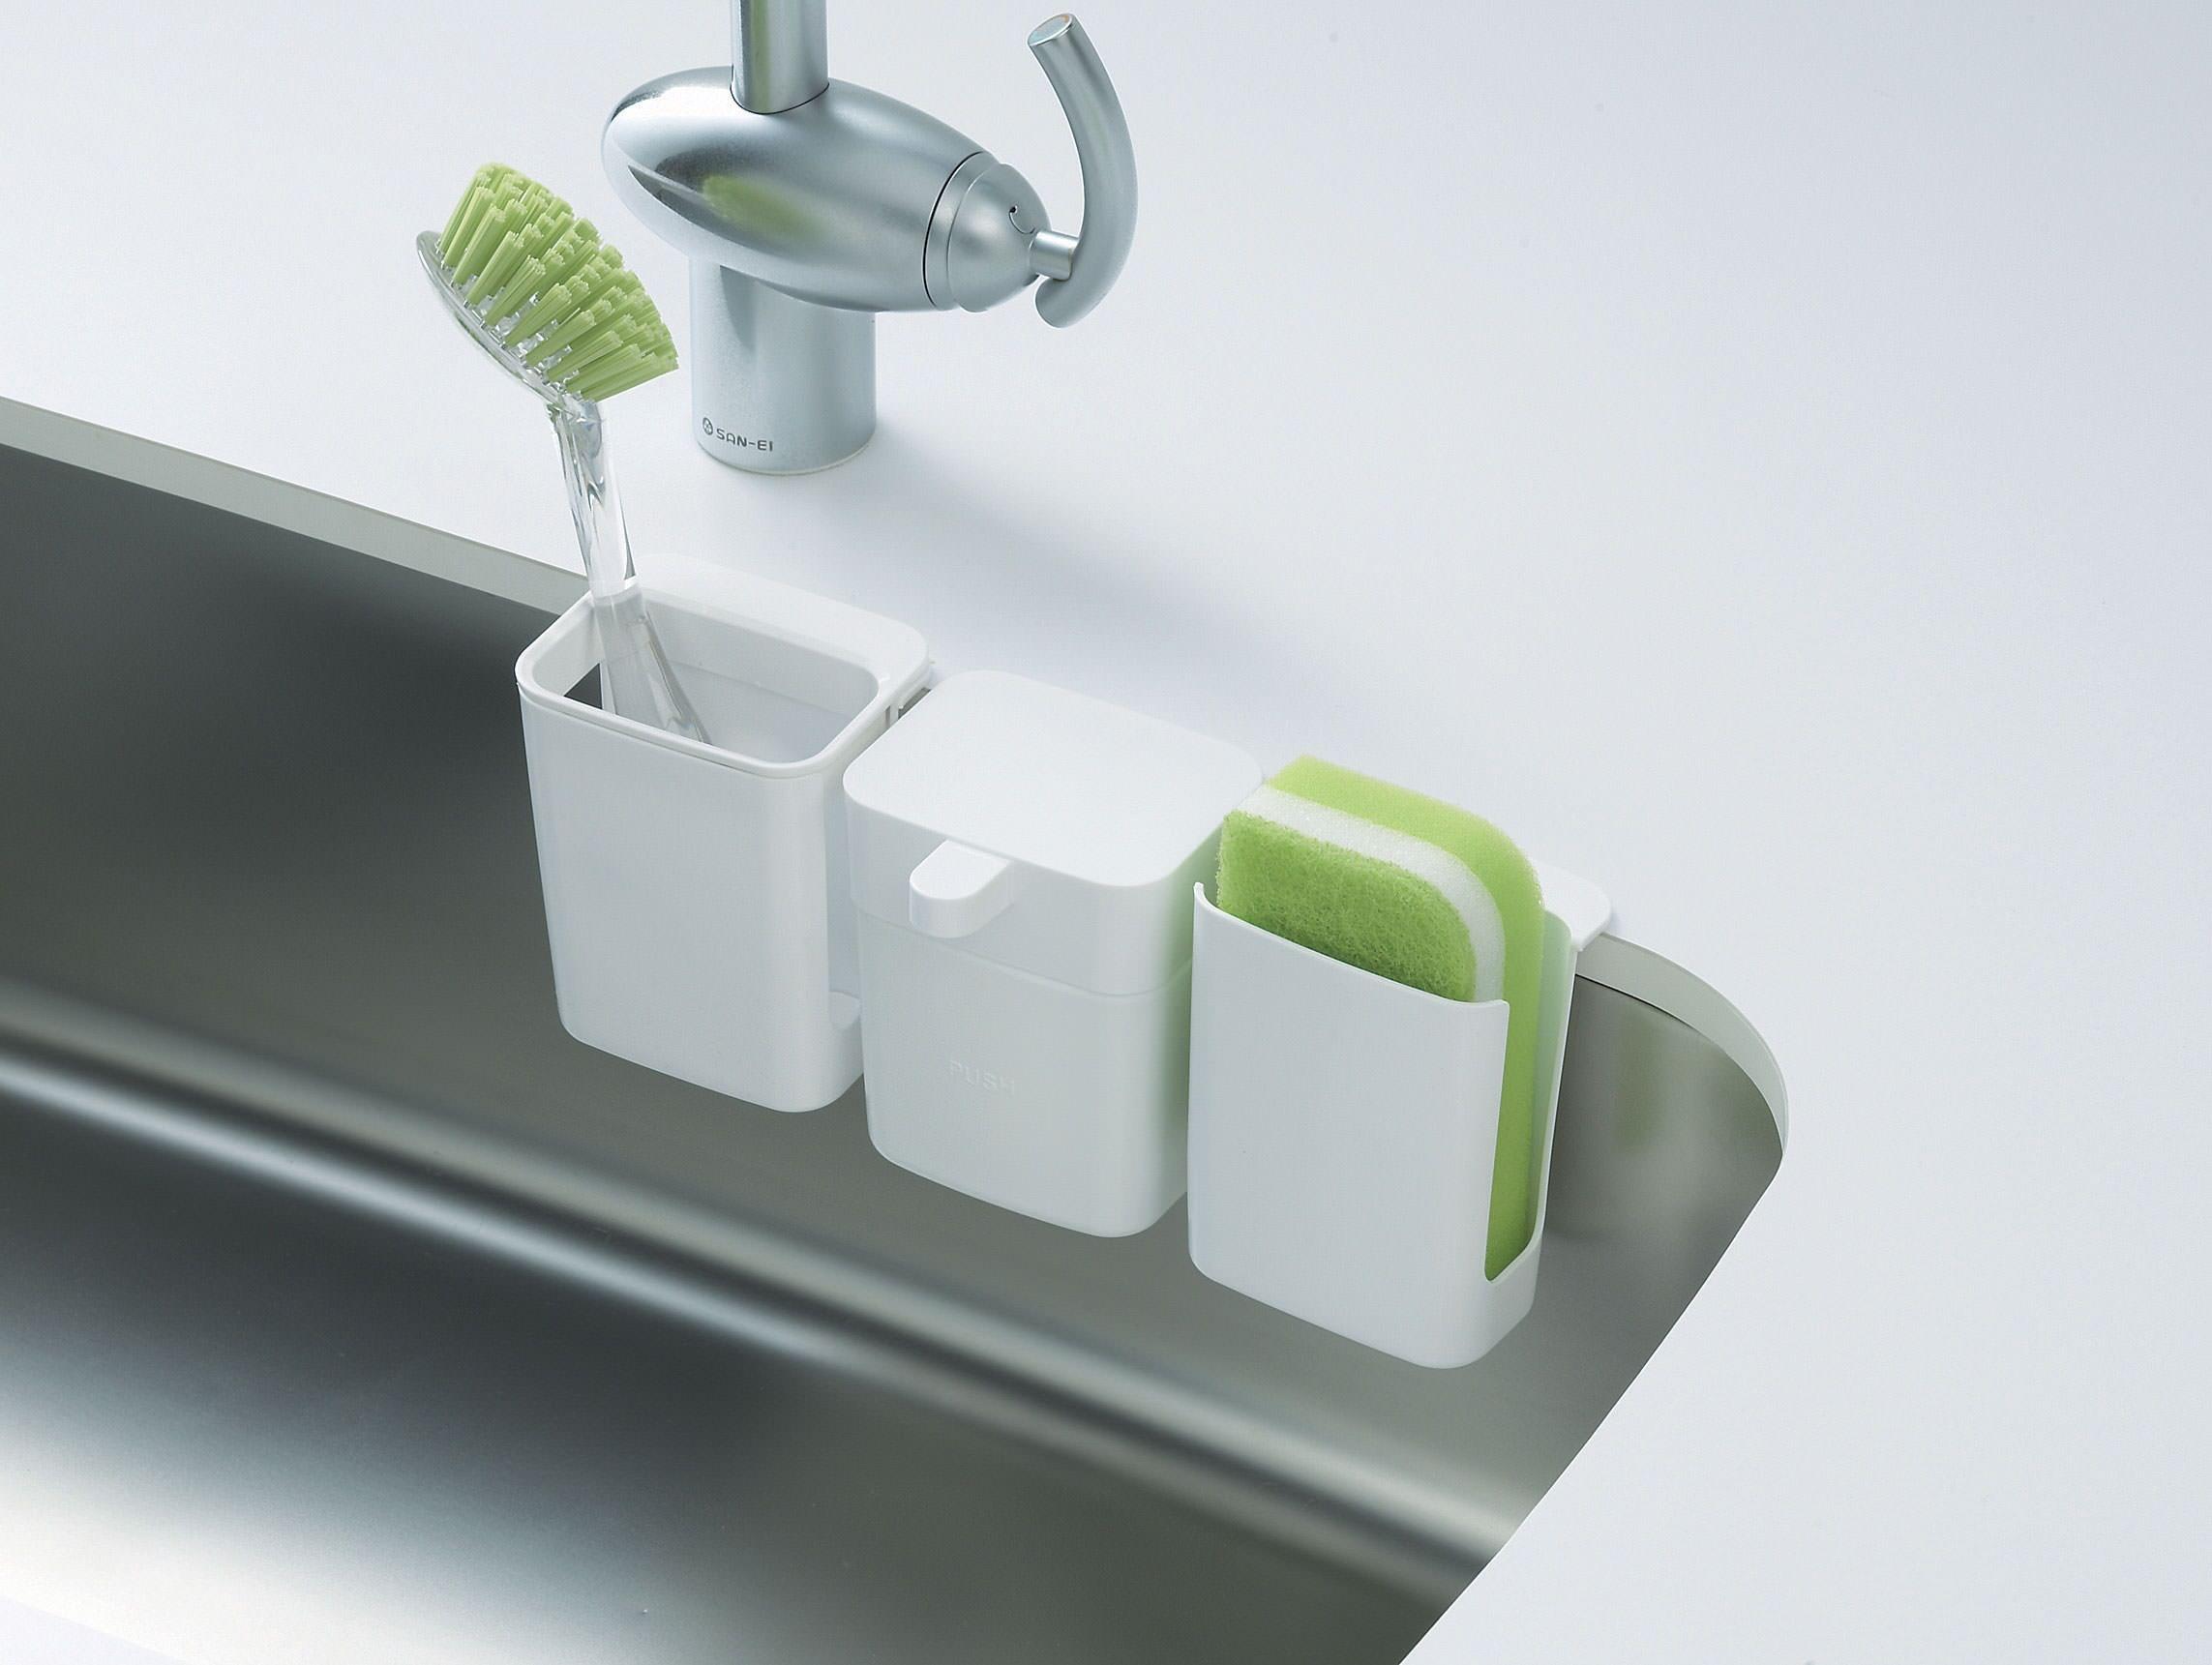 Ideas, kitchen sinks sponge brush holder kitchen sink backup main line intended for dimensions 2286 x 1721  .